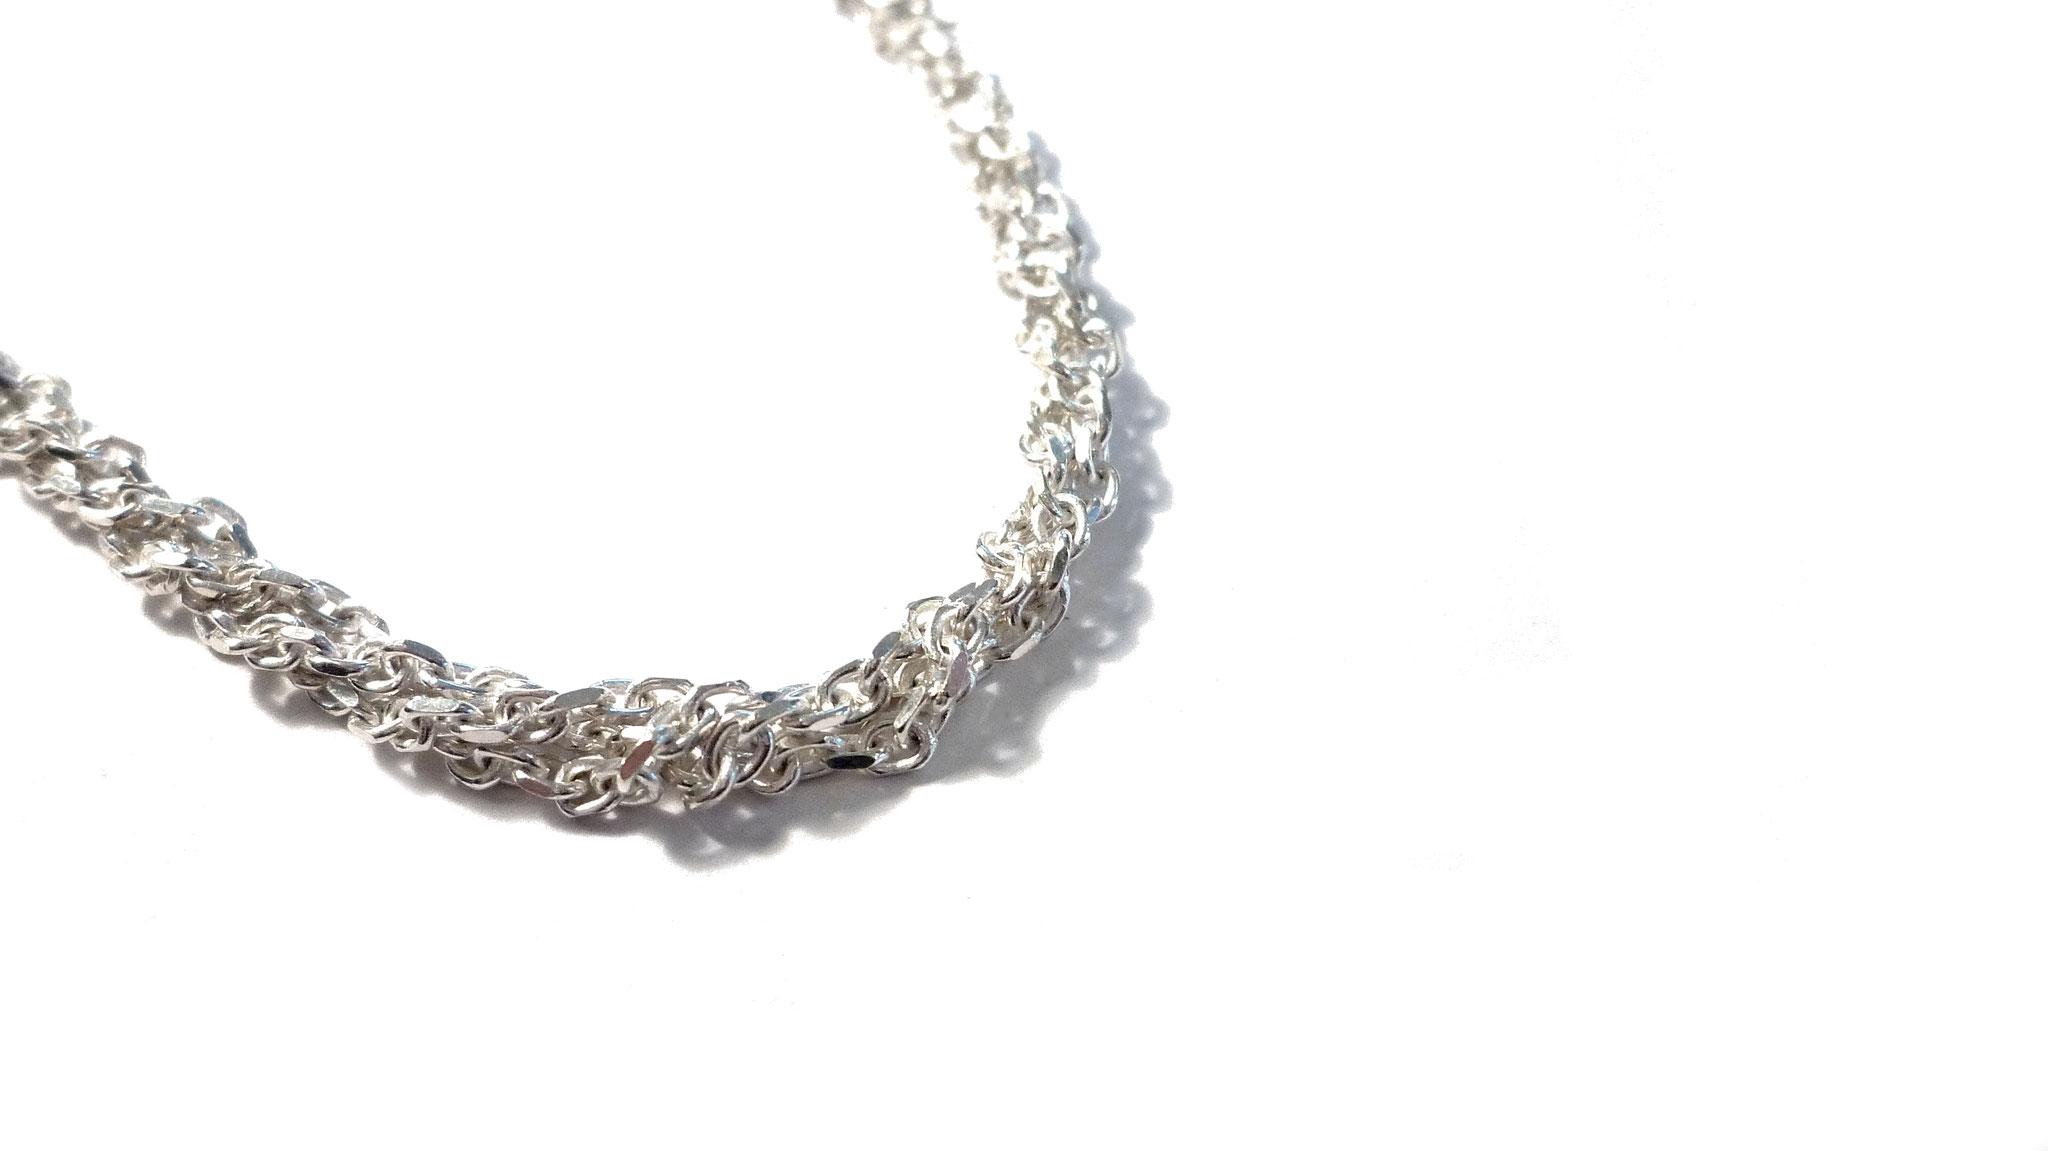 Bracelet aus Silber